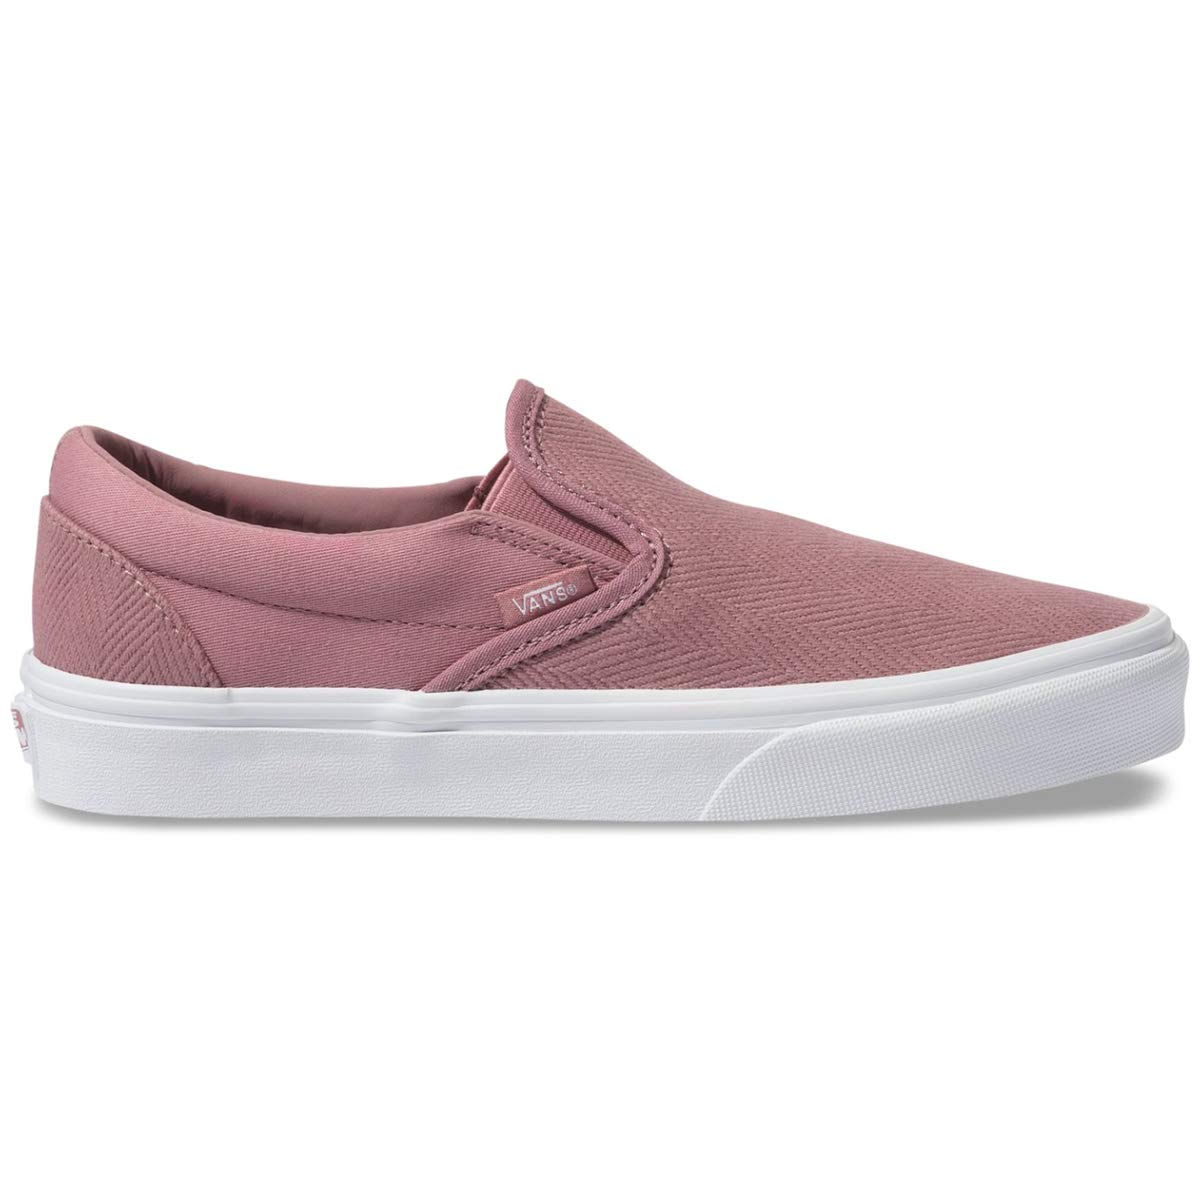 Vans Classic Slip-ON (Herringbone) Rose